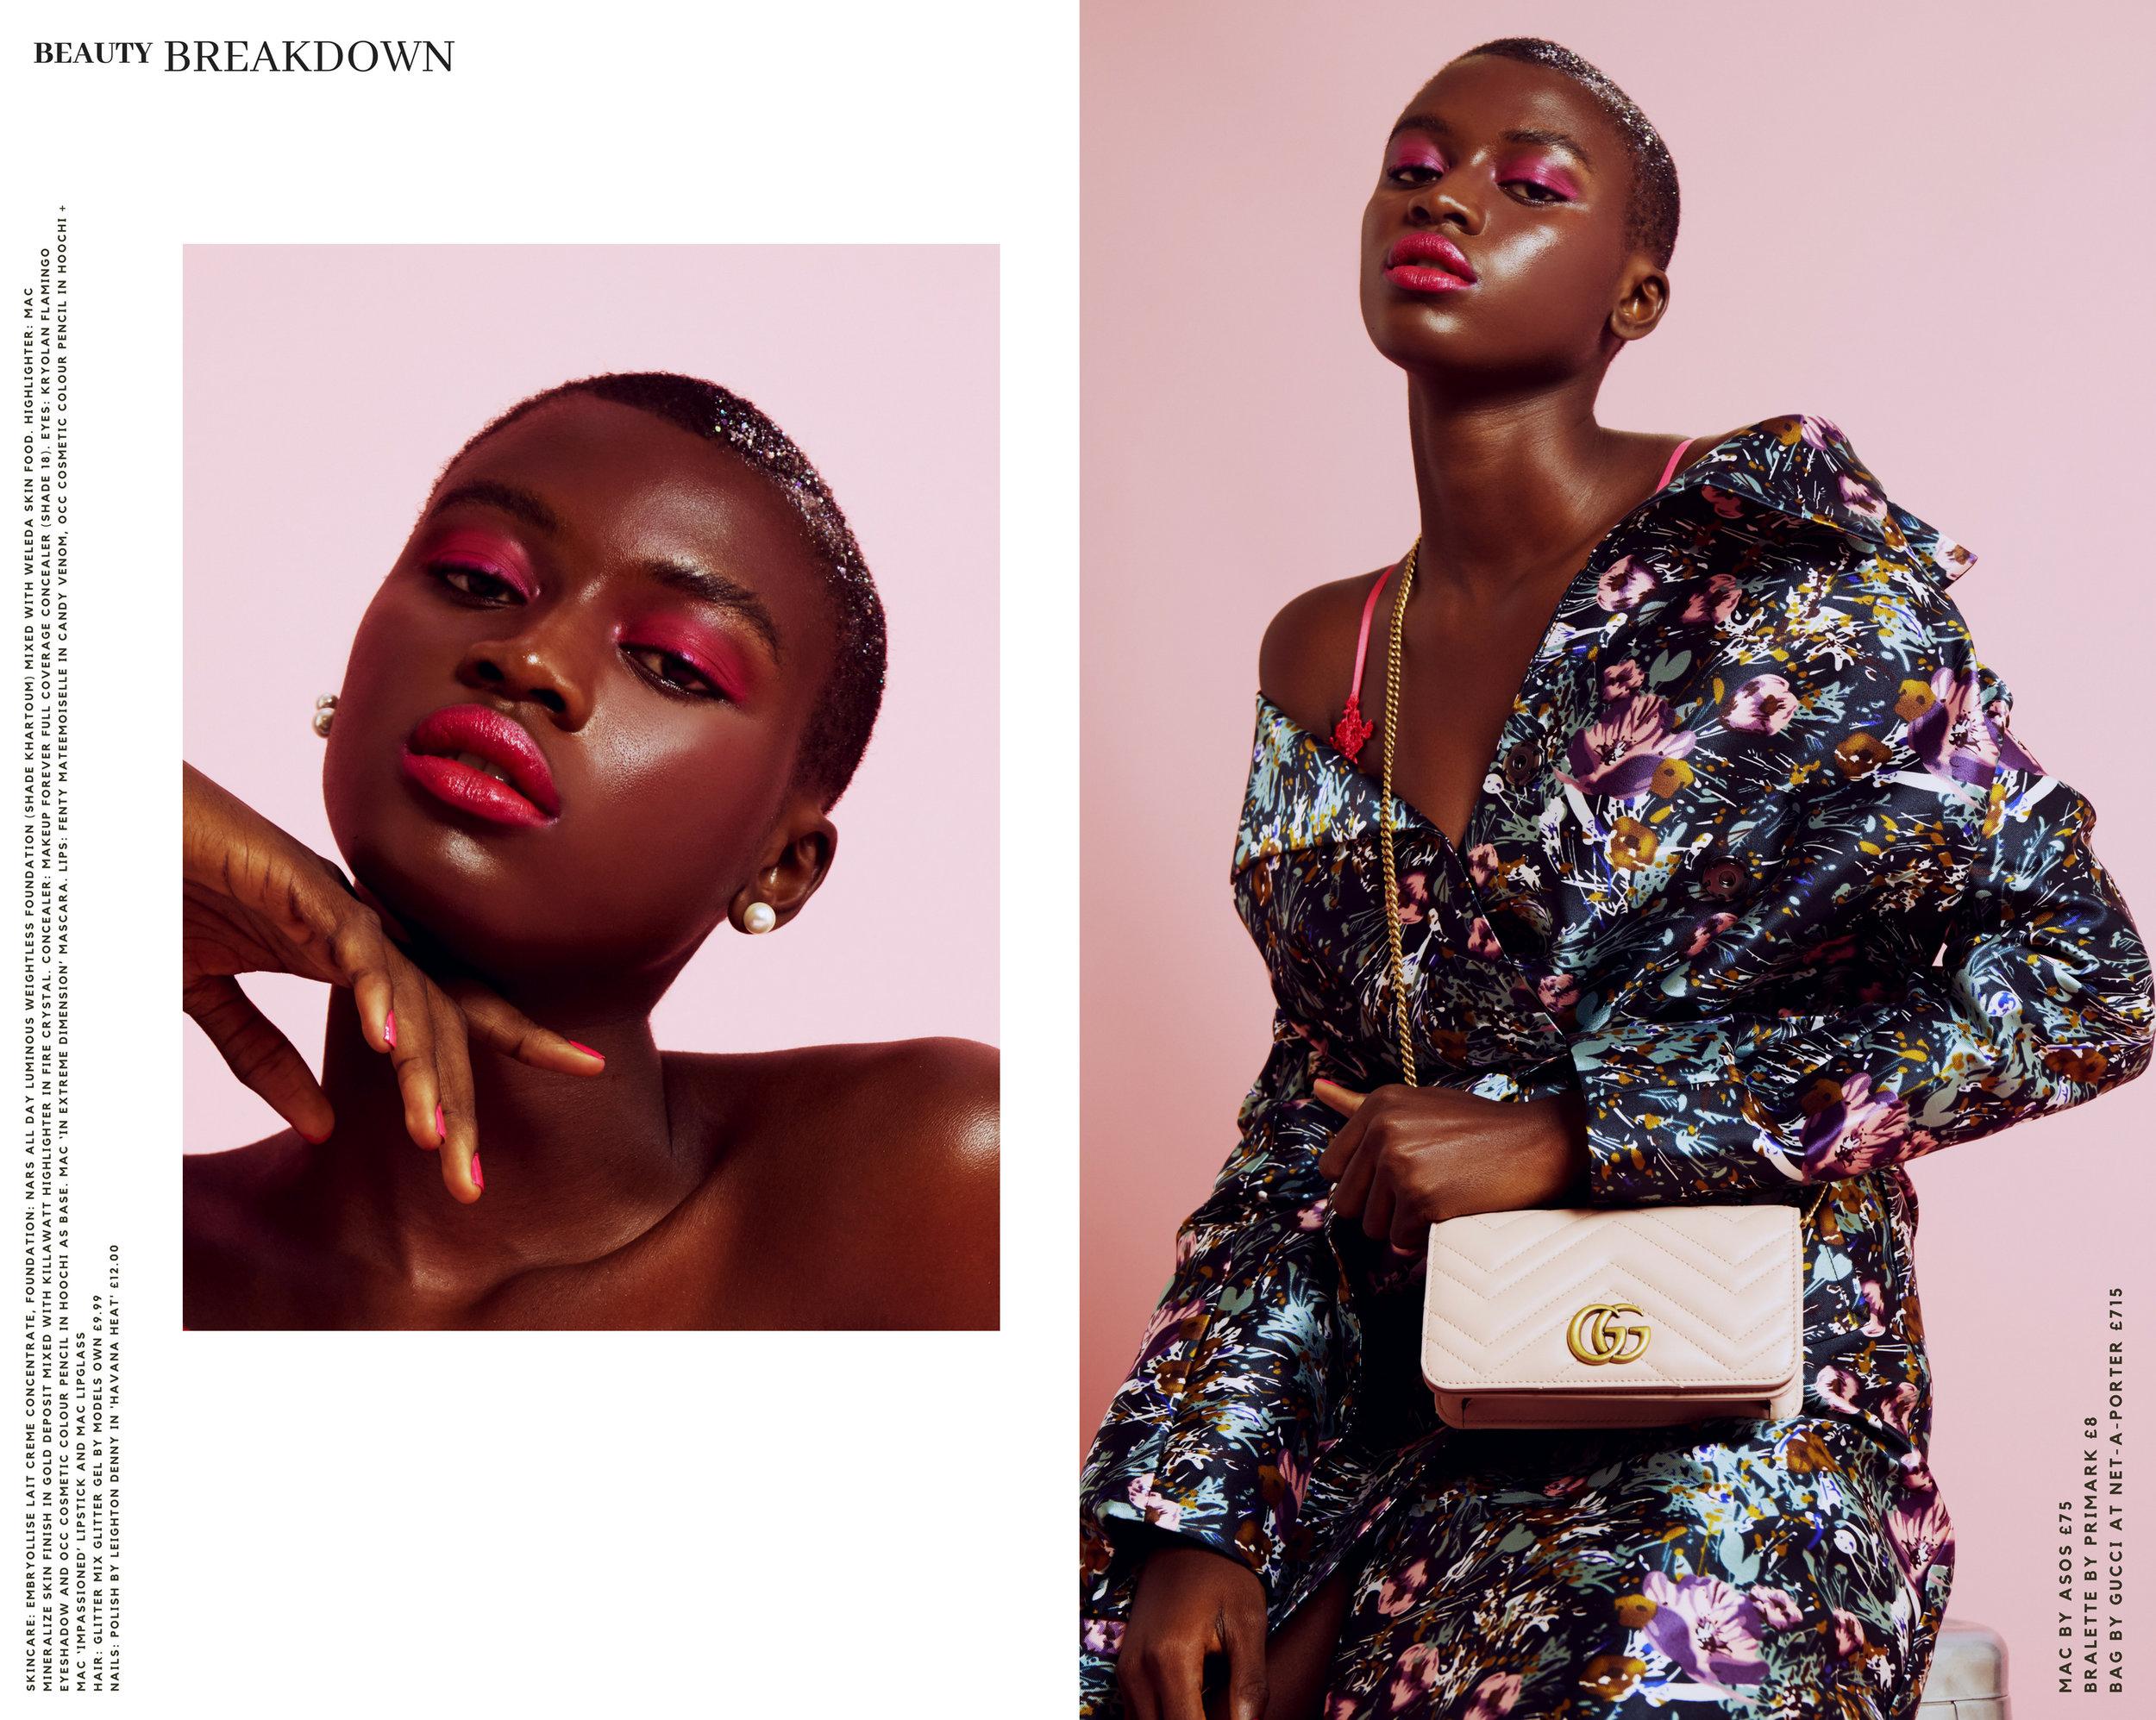 Bold+Beginnings+Fashion+Editorial+3.jpg